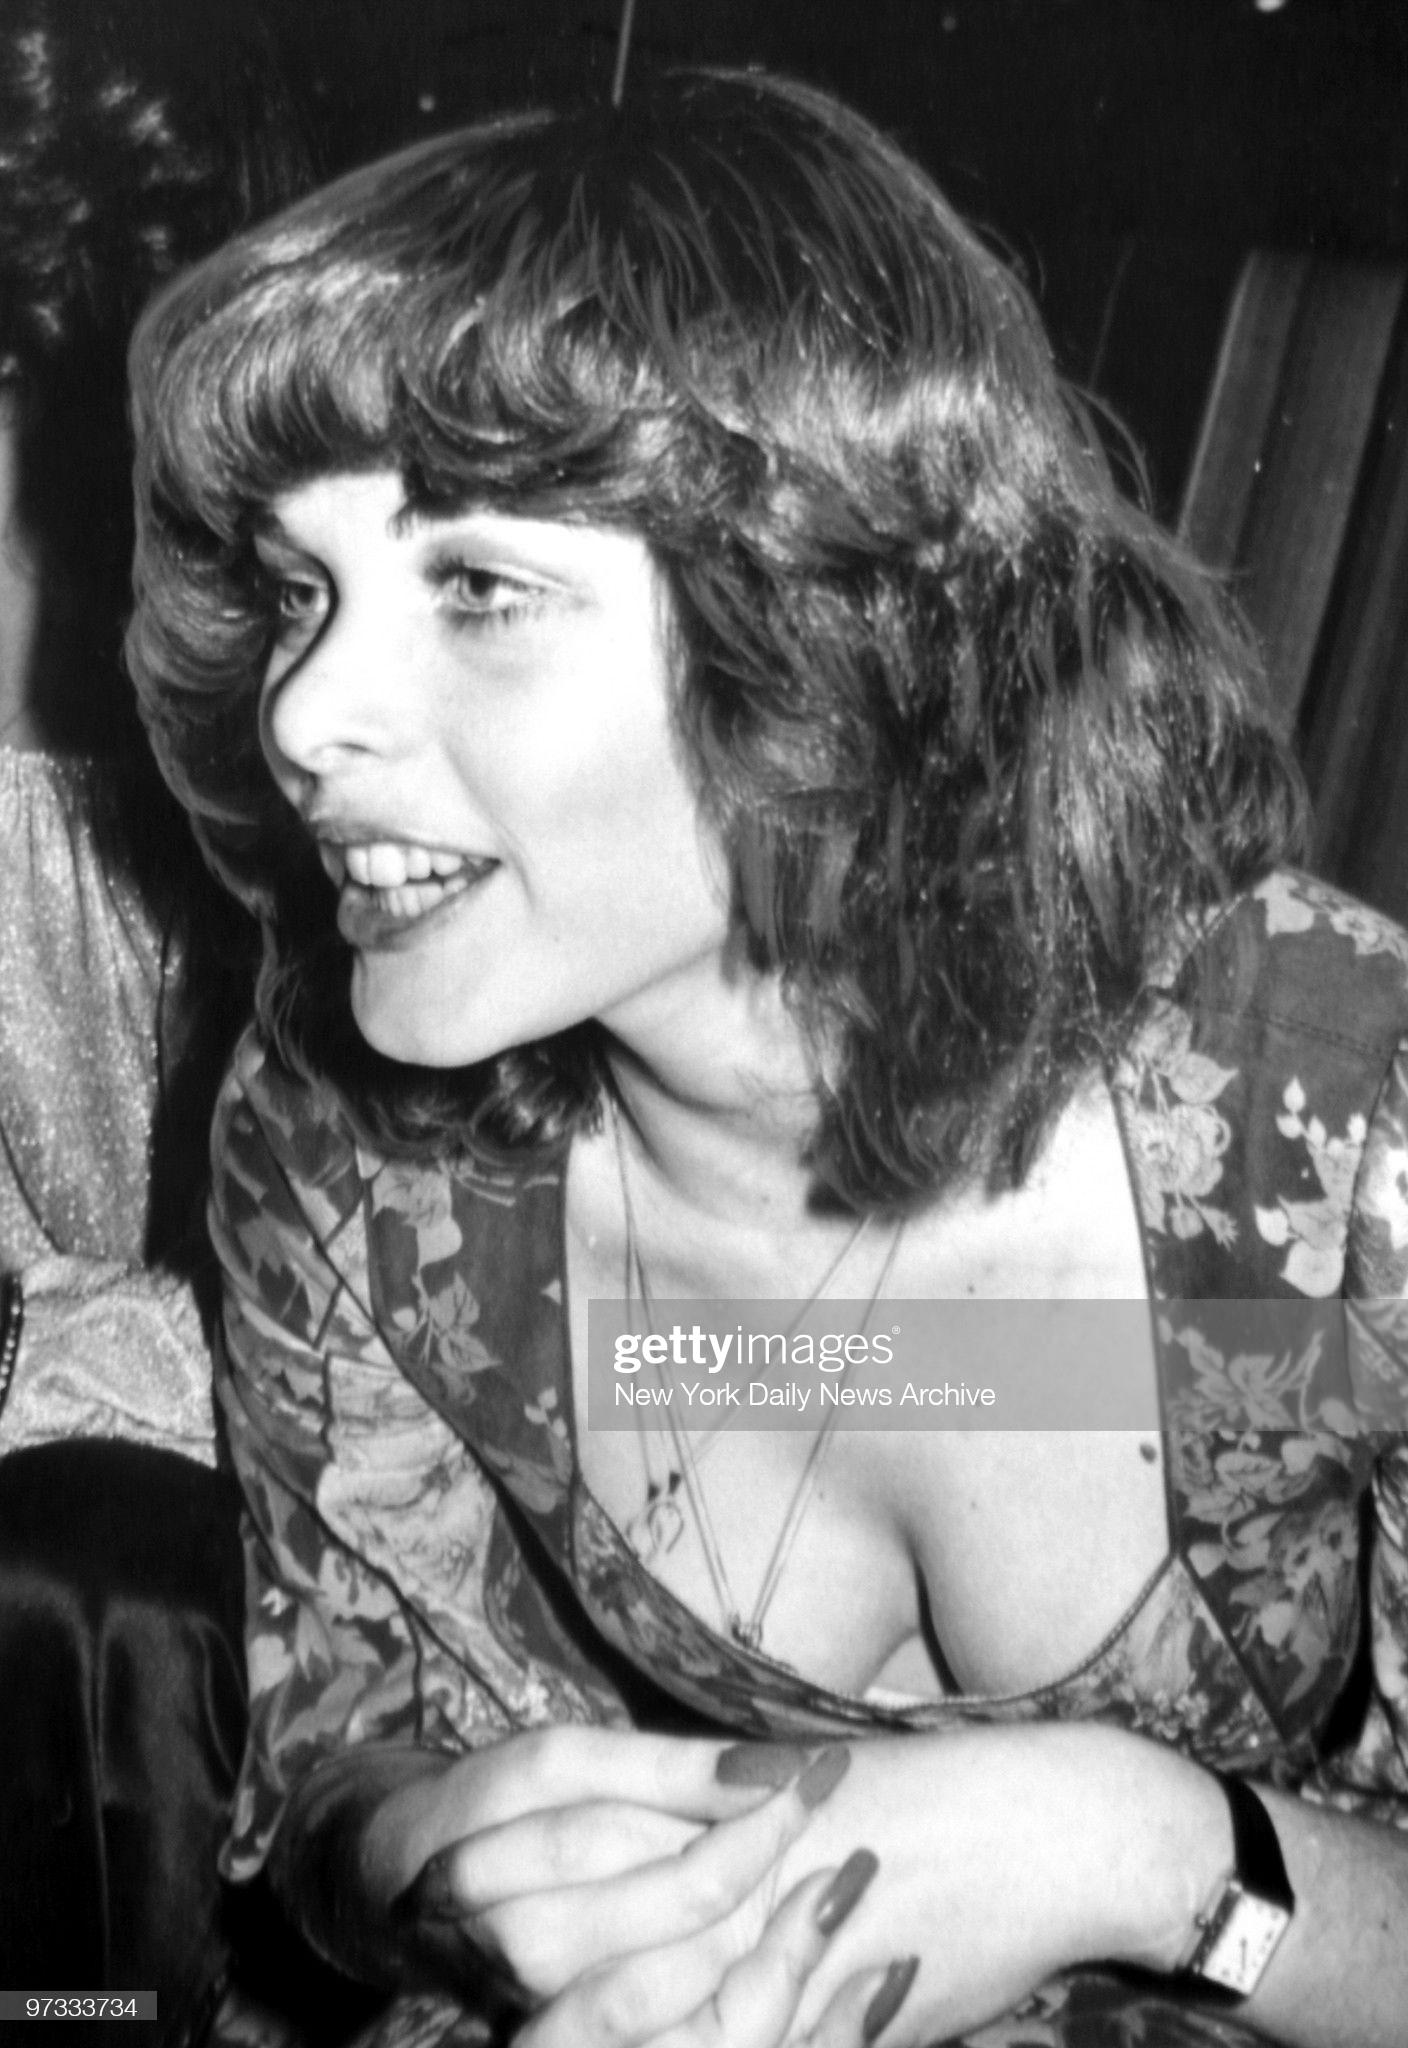 rina messinger, miss universe 1976. 23321617